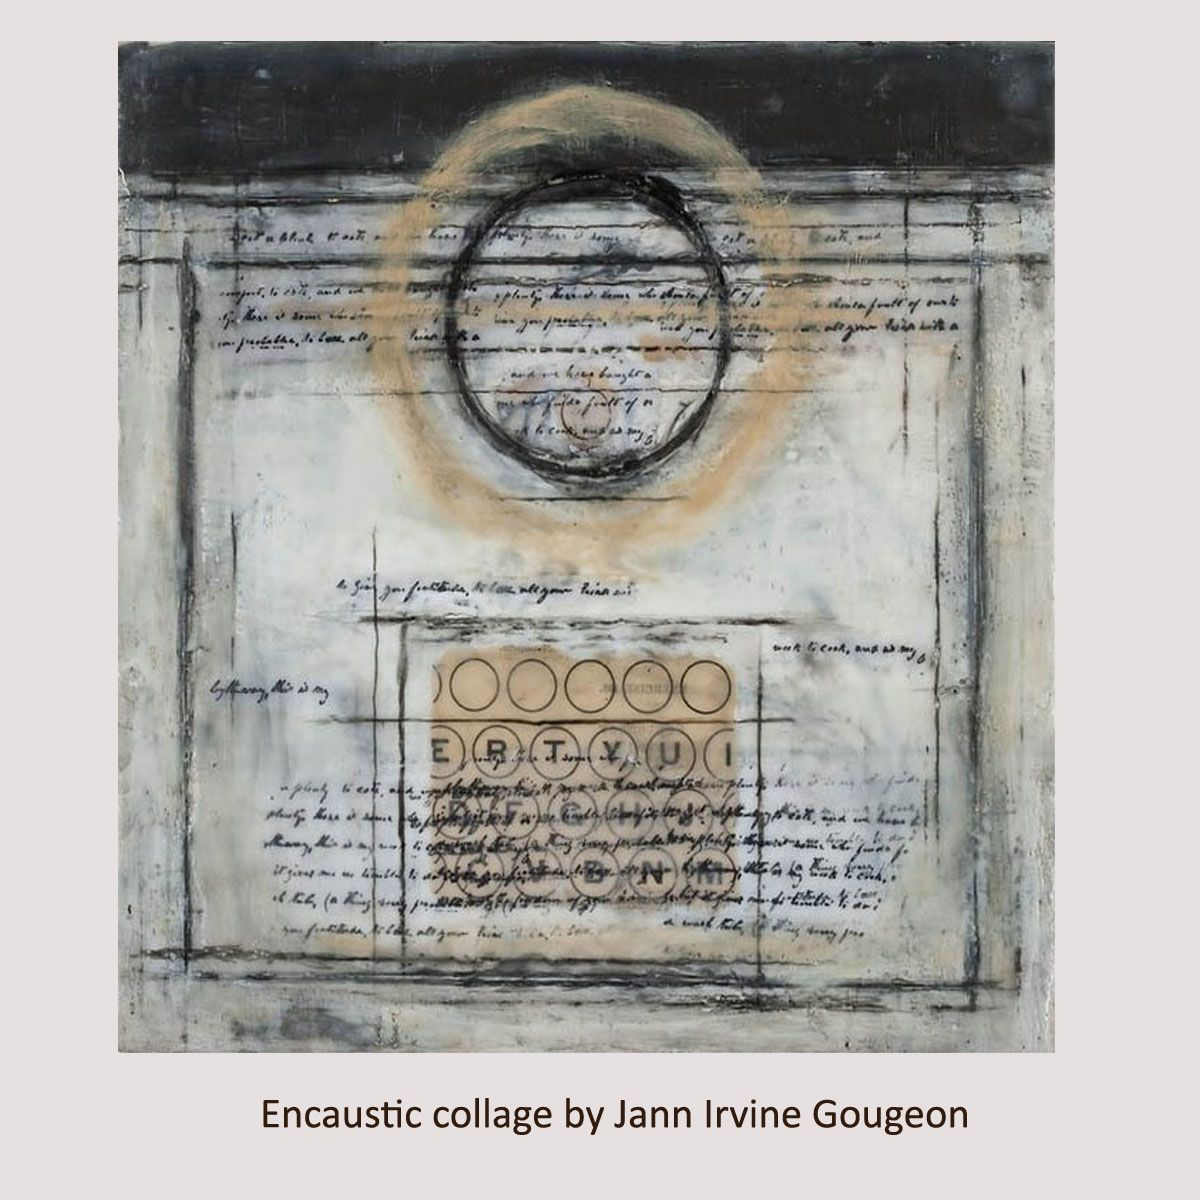 Encaustic Collage by Jann Irvine Gougeon